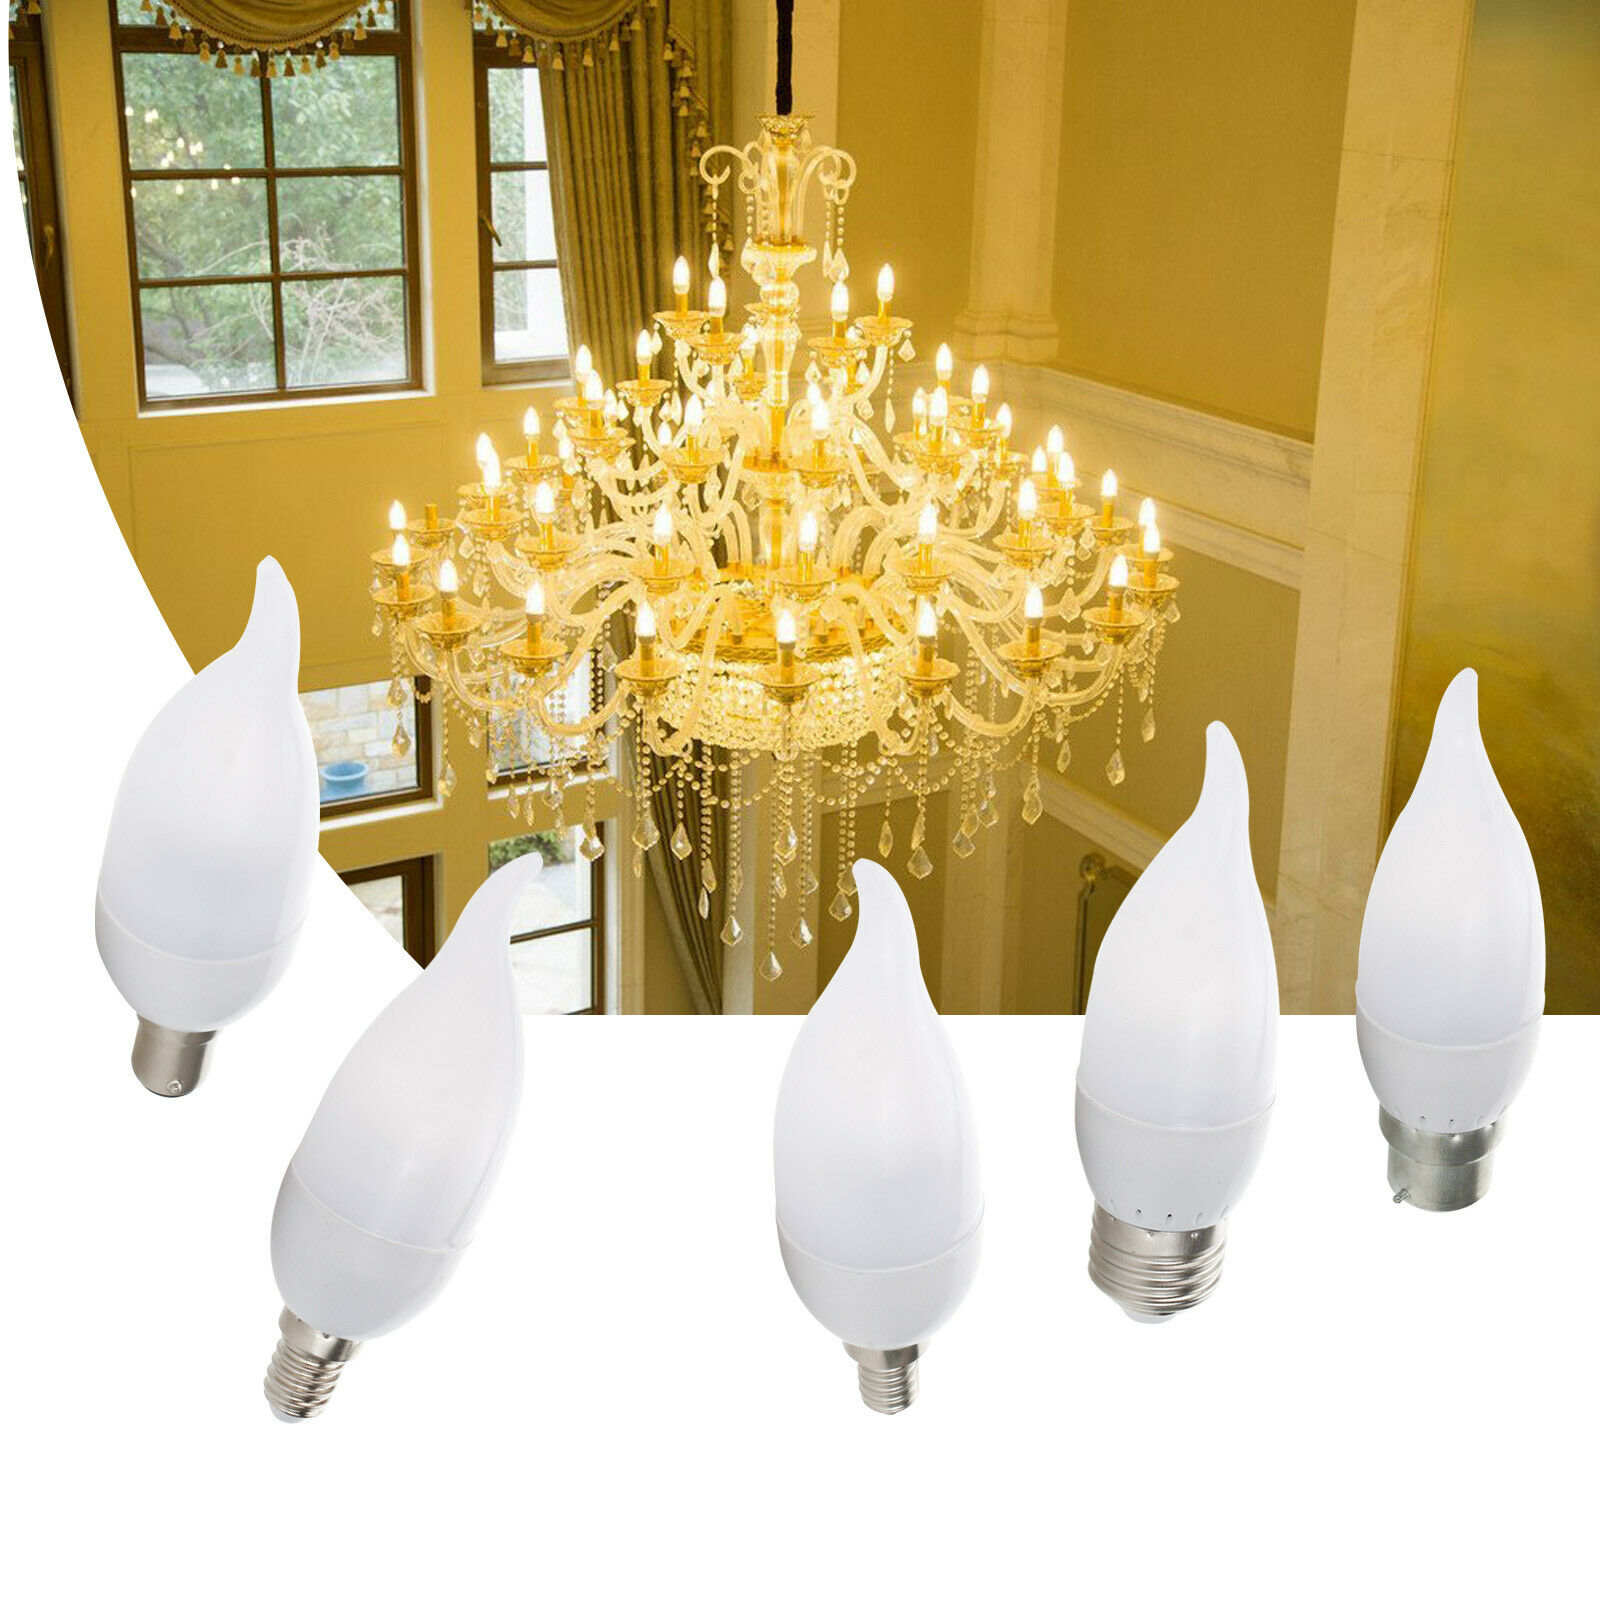 LED Flame Chandelier Bulb 3W E12 E14 SES B22 BC E27 Candle 2835 SMD Velas Decorativas Home Lighting Replace 25W Halogen Lamps